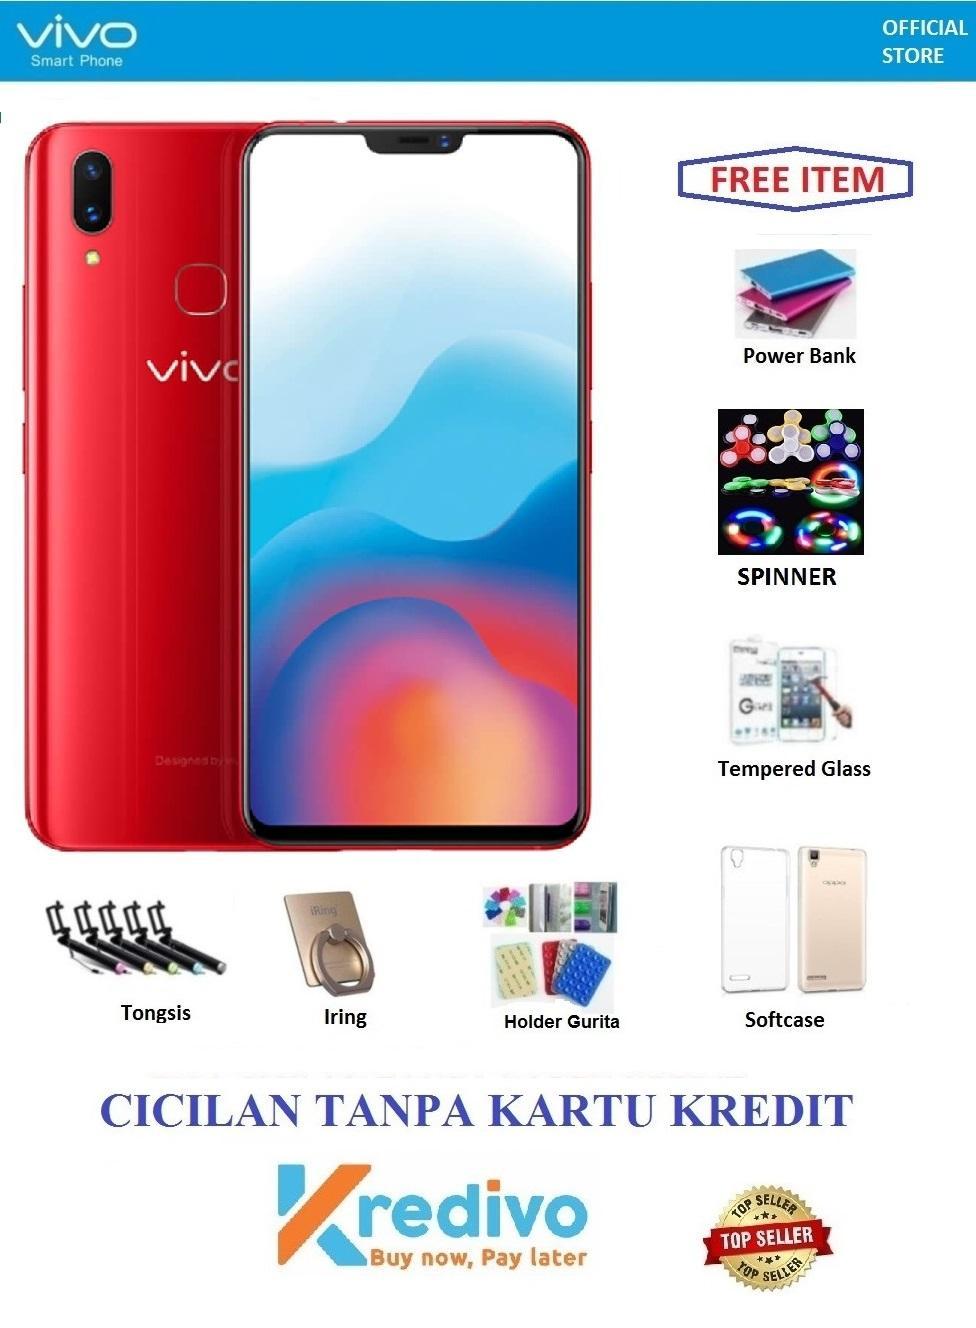 Vivo V9 Ram 6/64GB - Bisa Cicilan Tanpa Kartu Kredit + Free 7 Items